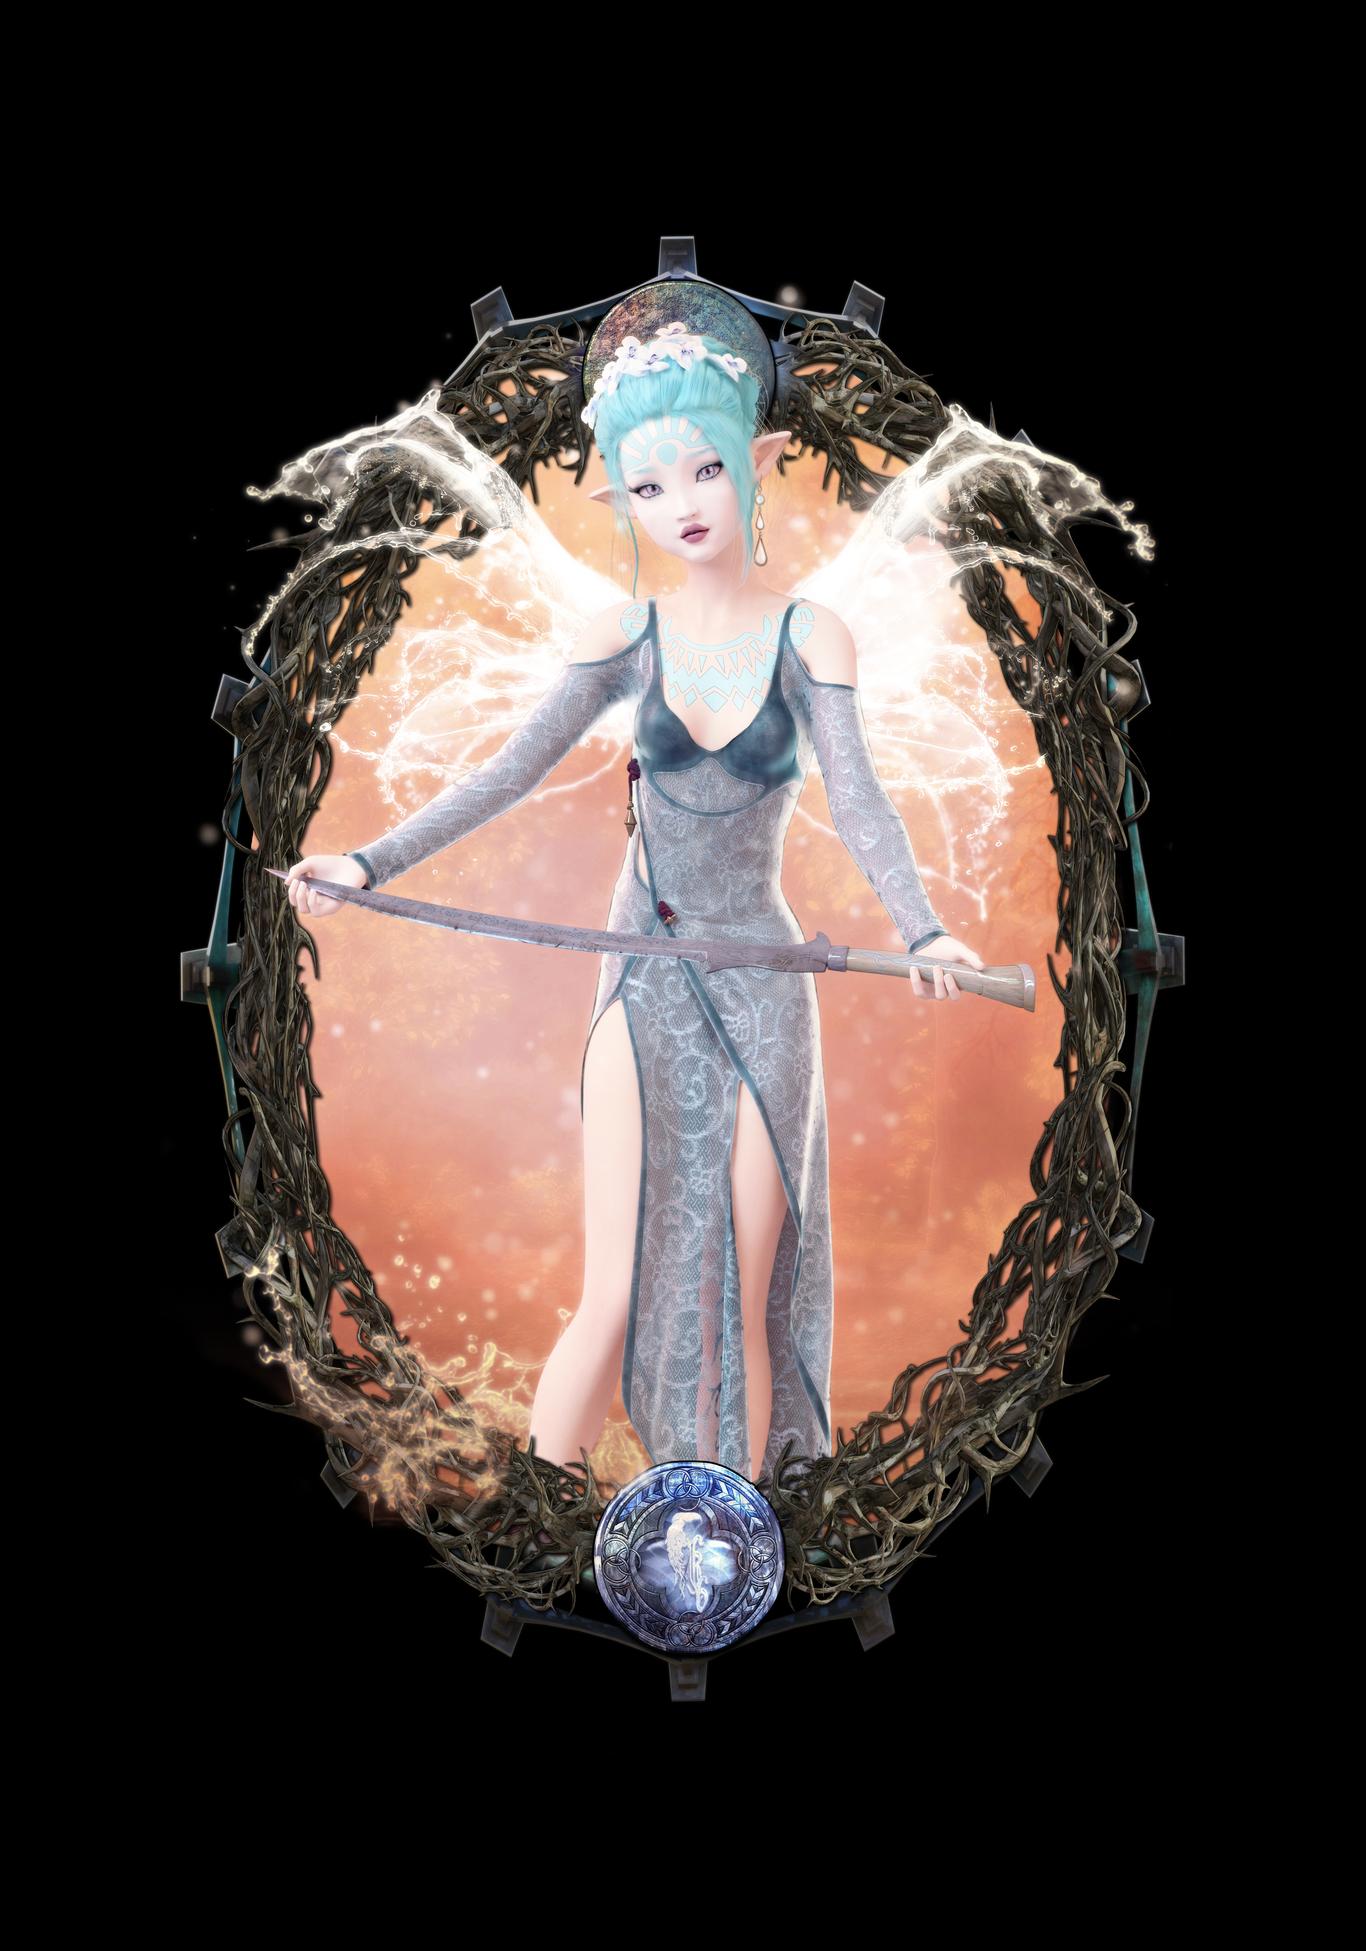 Shanuri nimue lady of the la 1 3981b61e gcxh